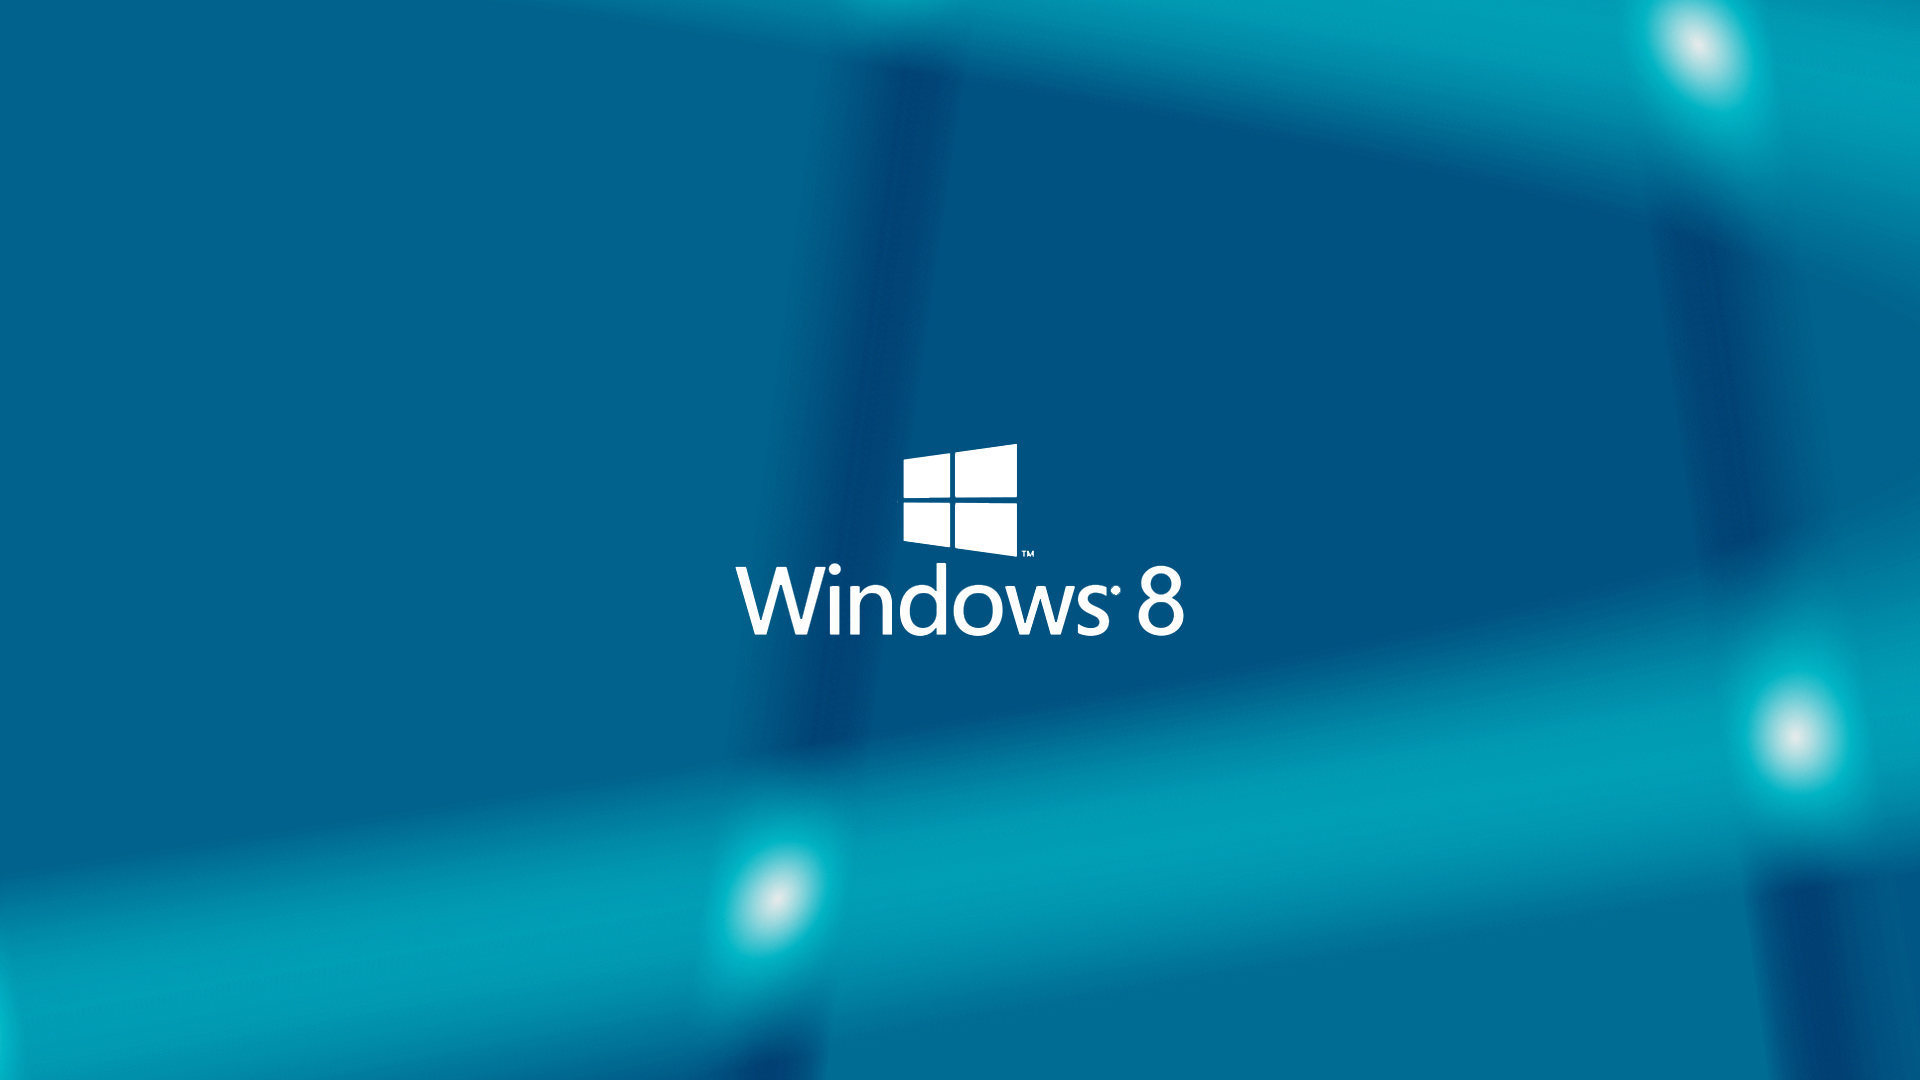 Wallpapers Windows 8